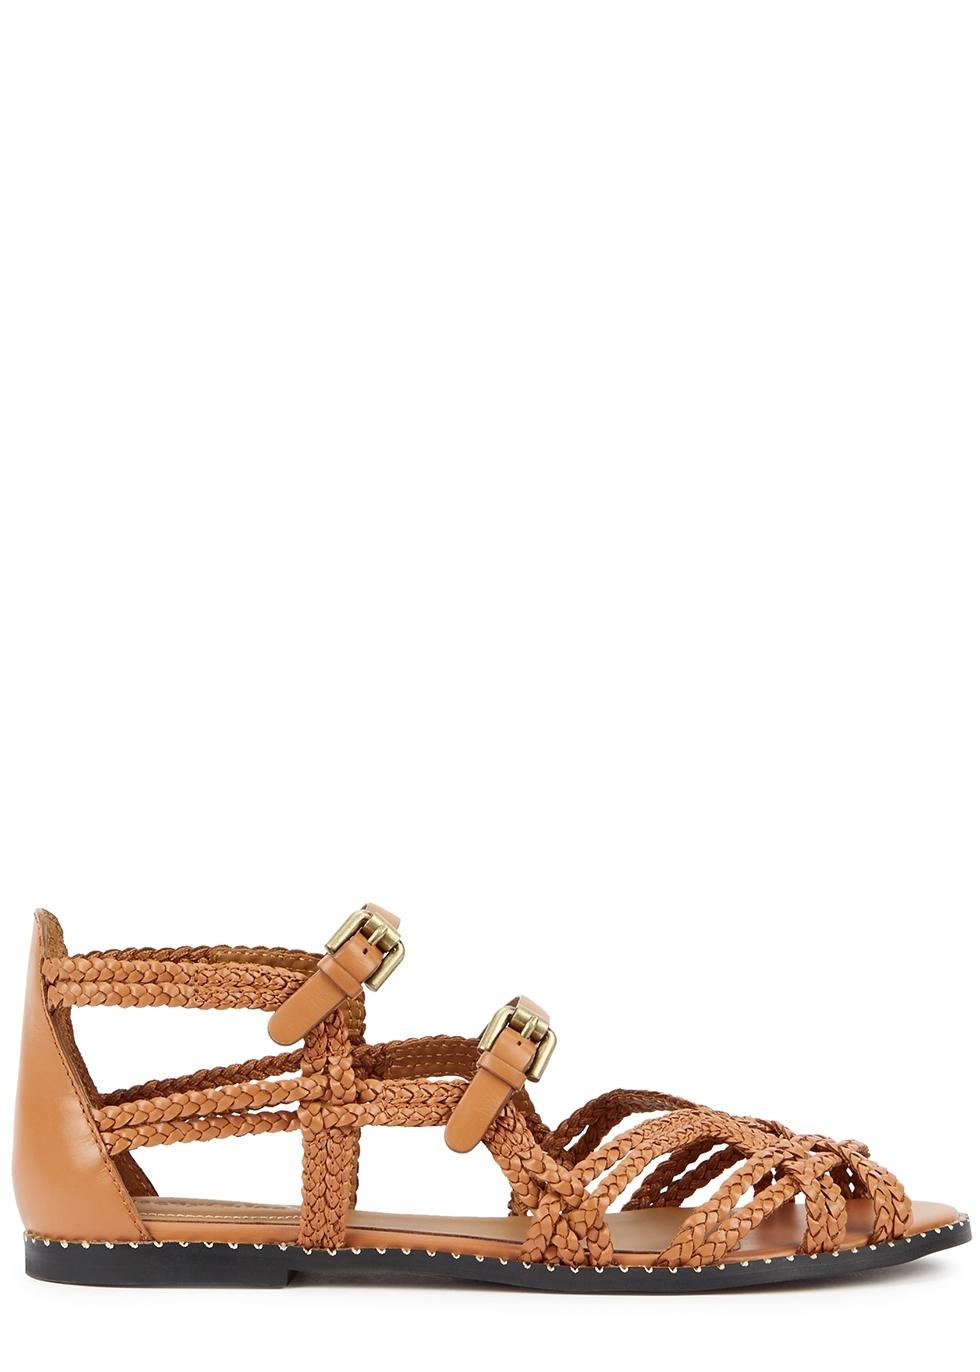 2aef6ea4abcc Women s Designer Flat Sandals - Harvey Nichols